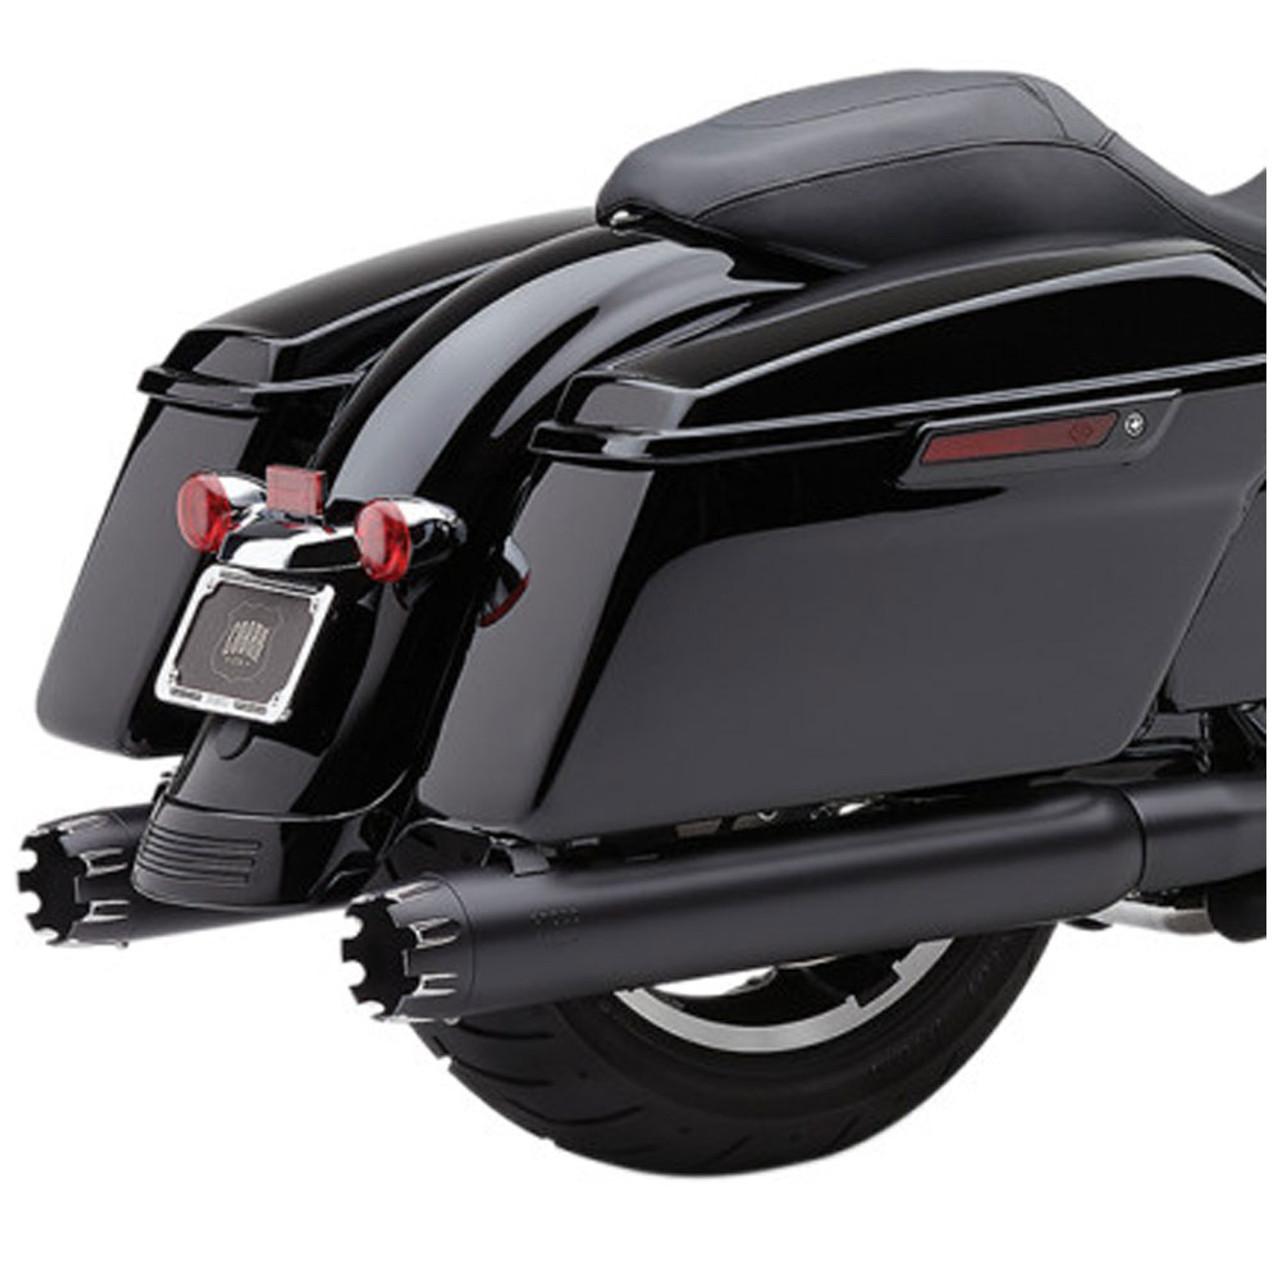 cobra 4 slip on exhaust mufflers for 1999 2016 harley touring black w dual cut machined tip